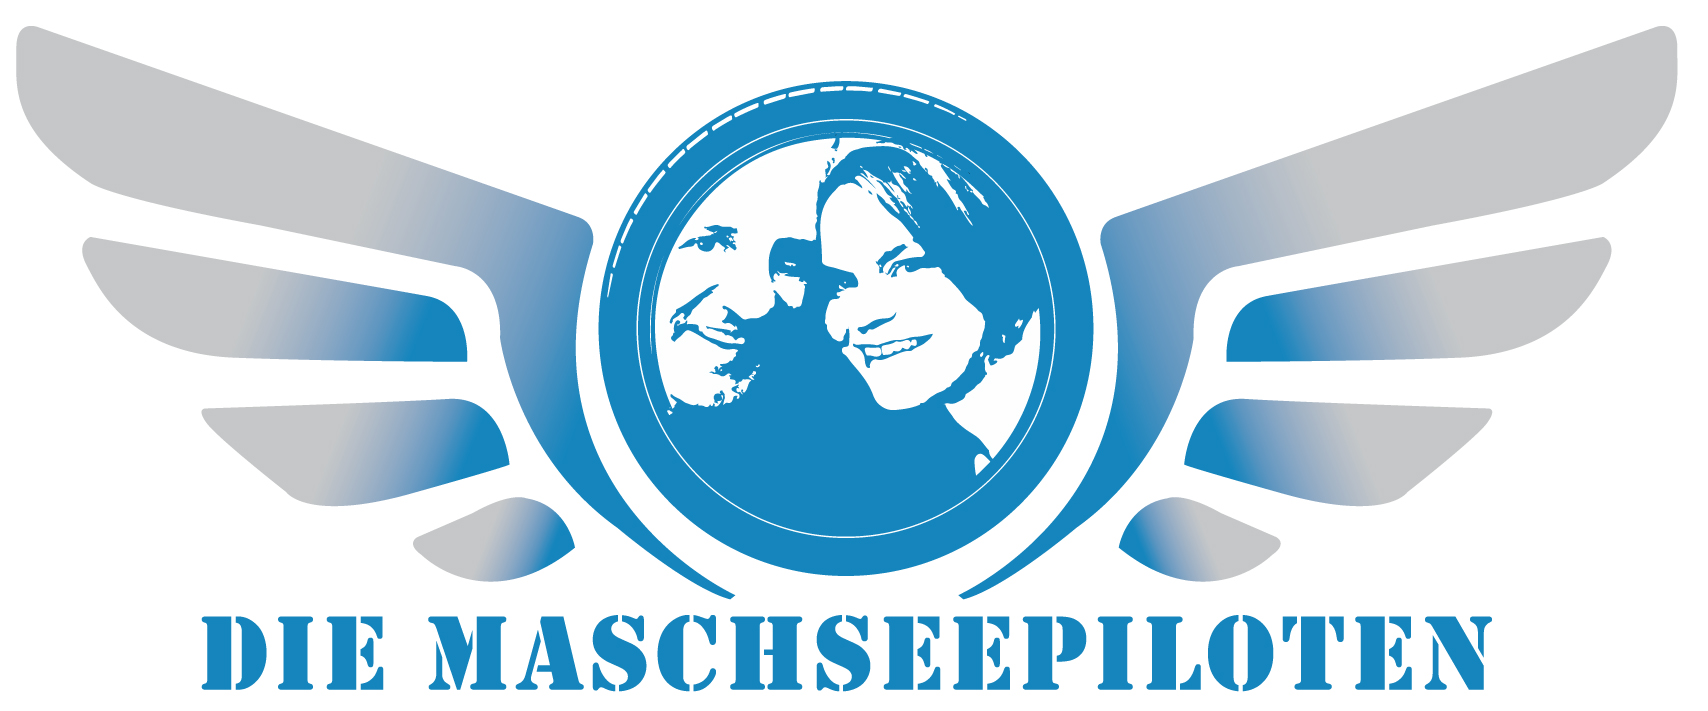 Maschseepiloten Logo